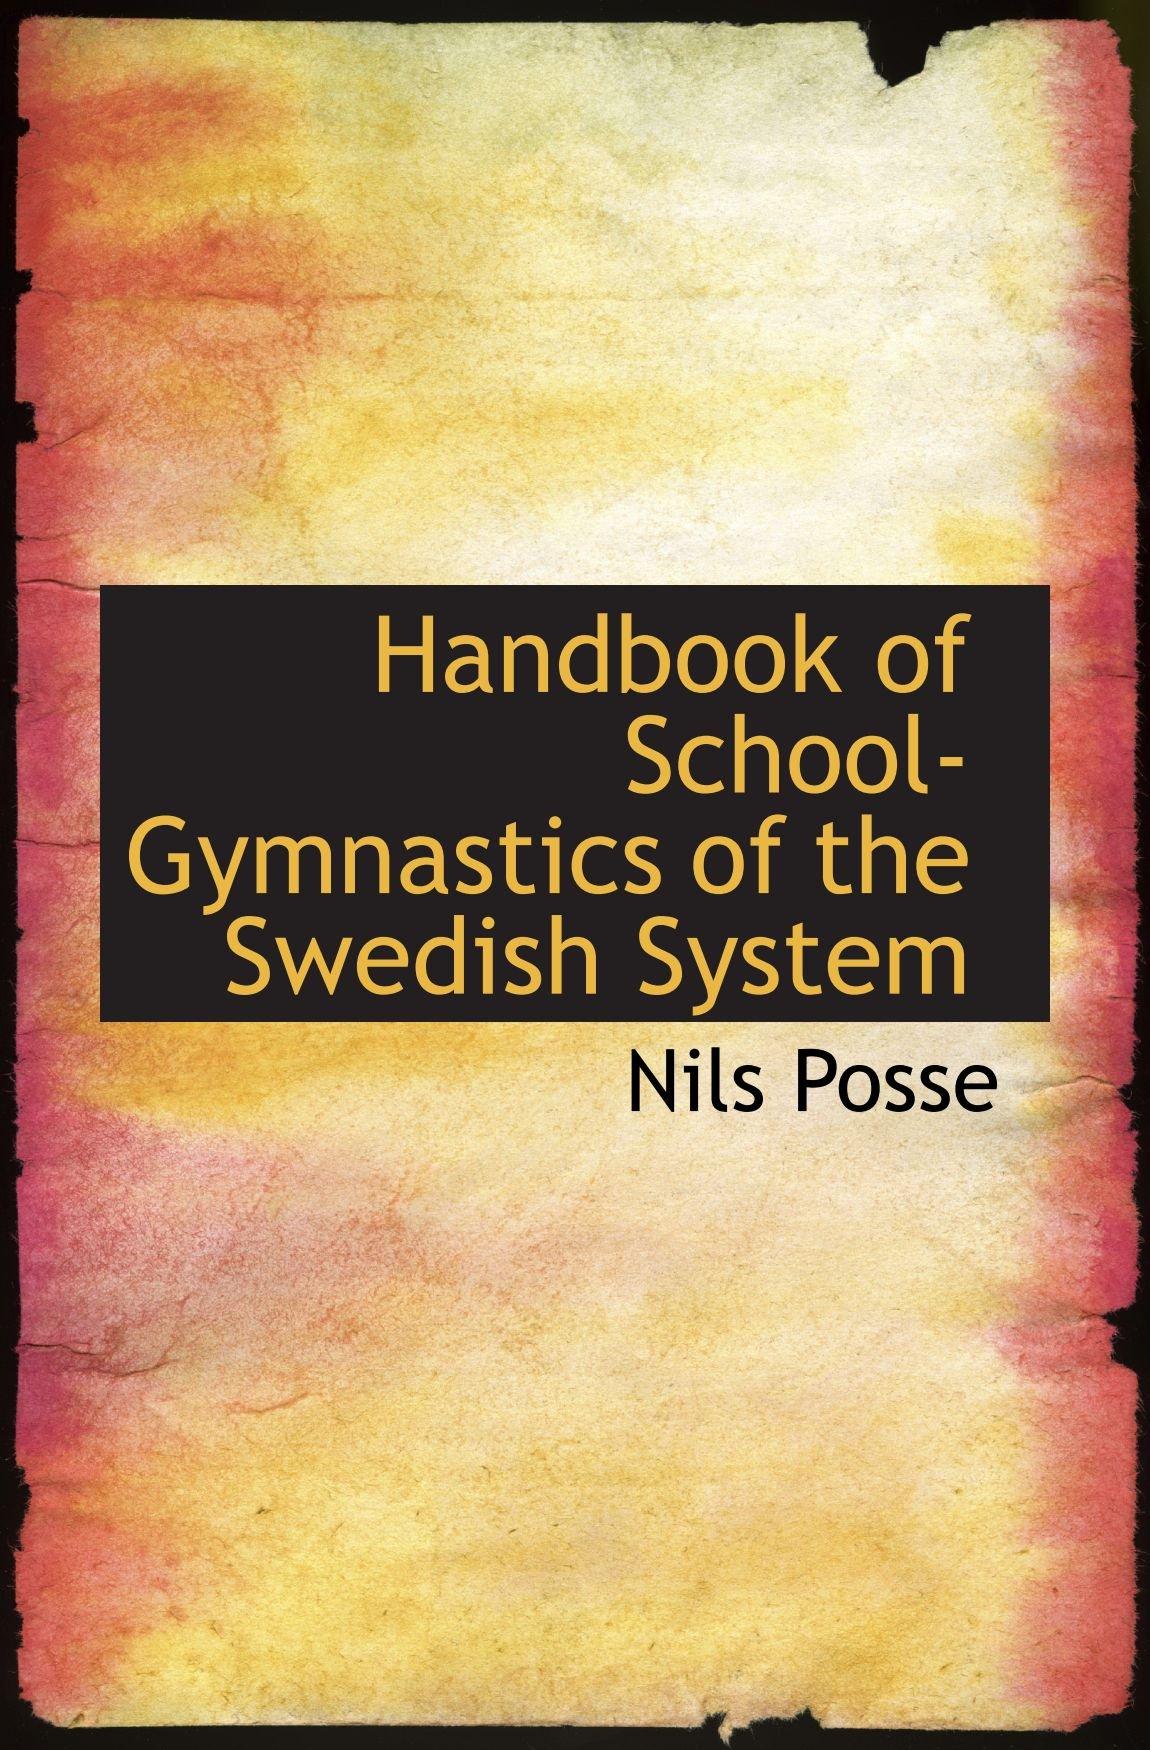 Handbook of School-Gymnastics of the Swedish System pdf